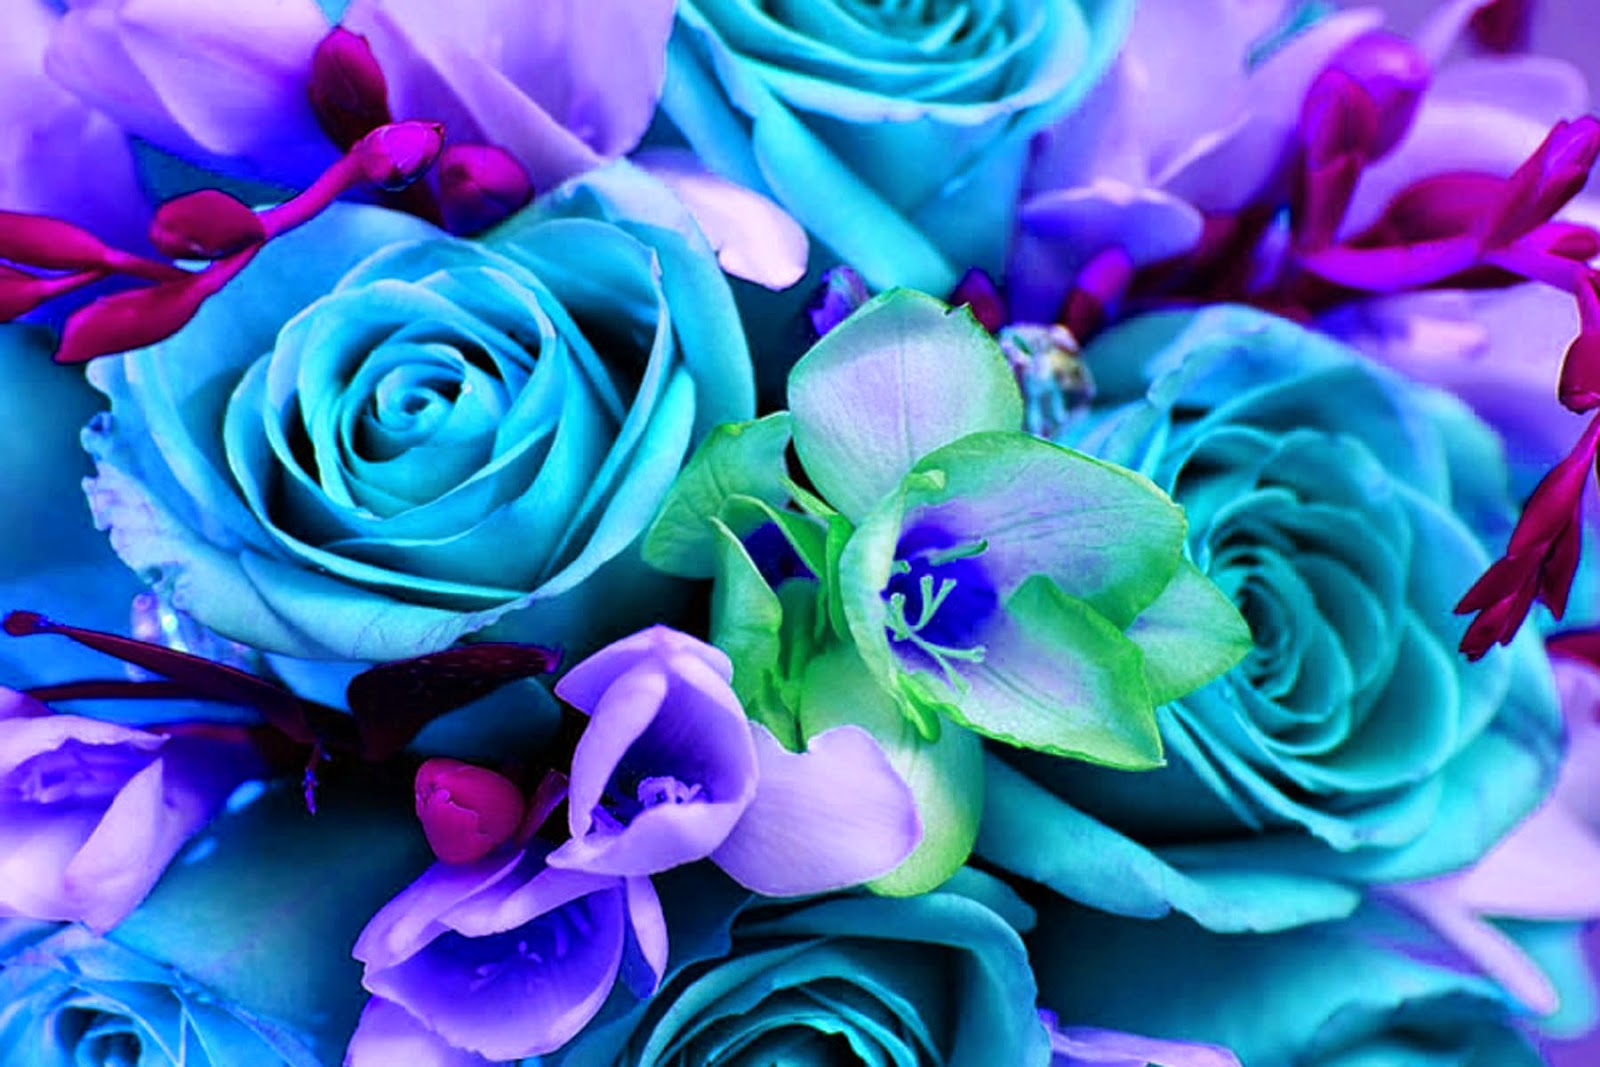 Light Blue Rose Wallpaper, Pc Light Blue Rose Wallpaper Most